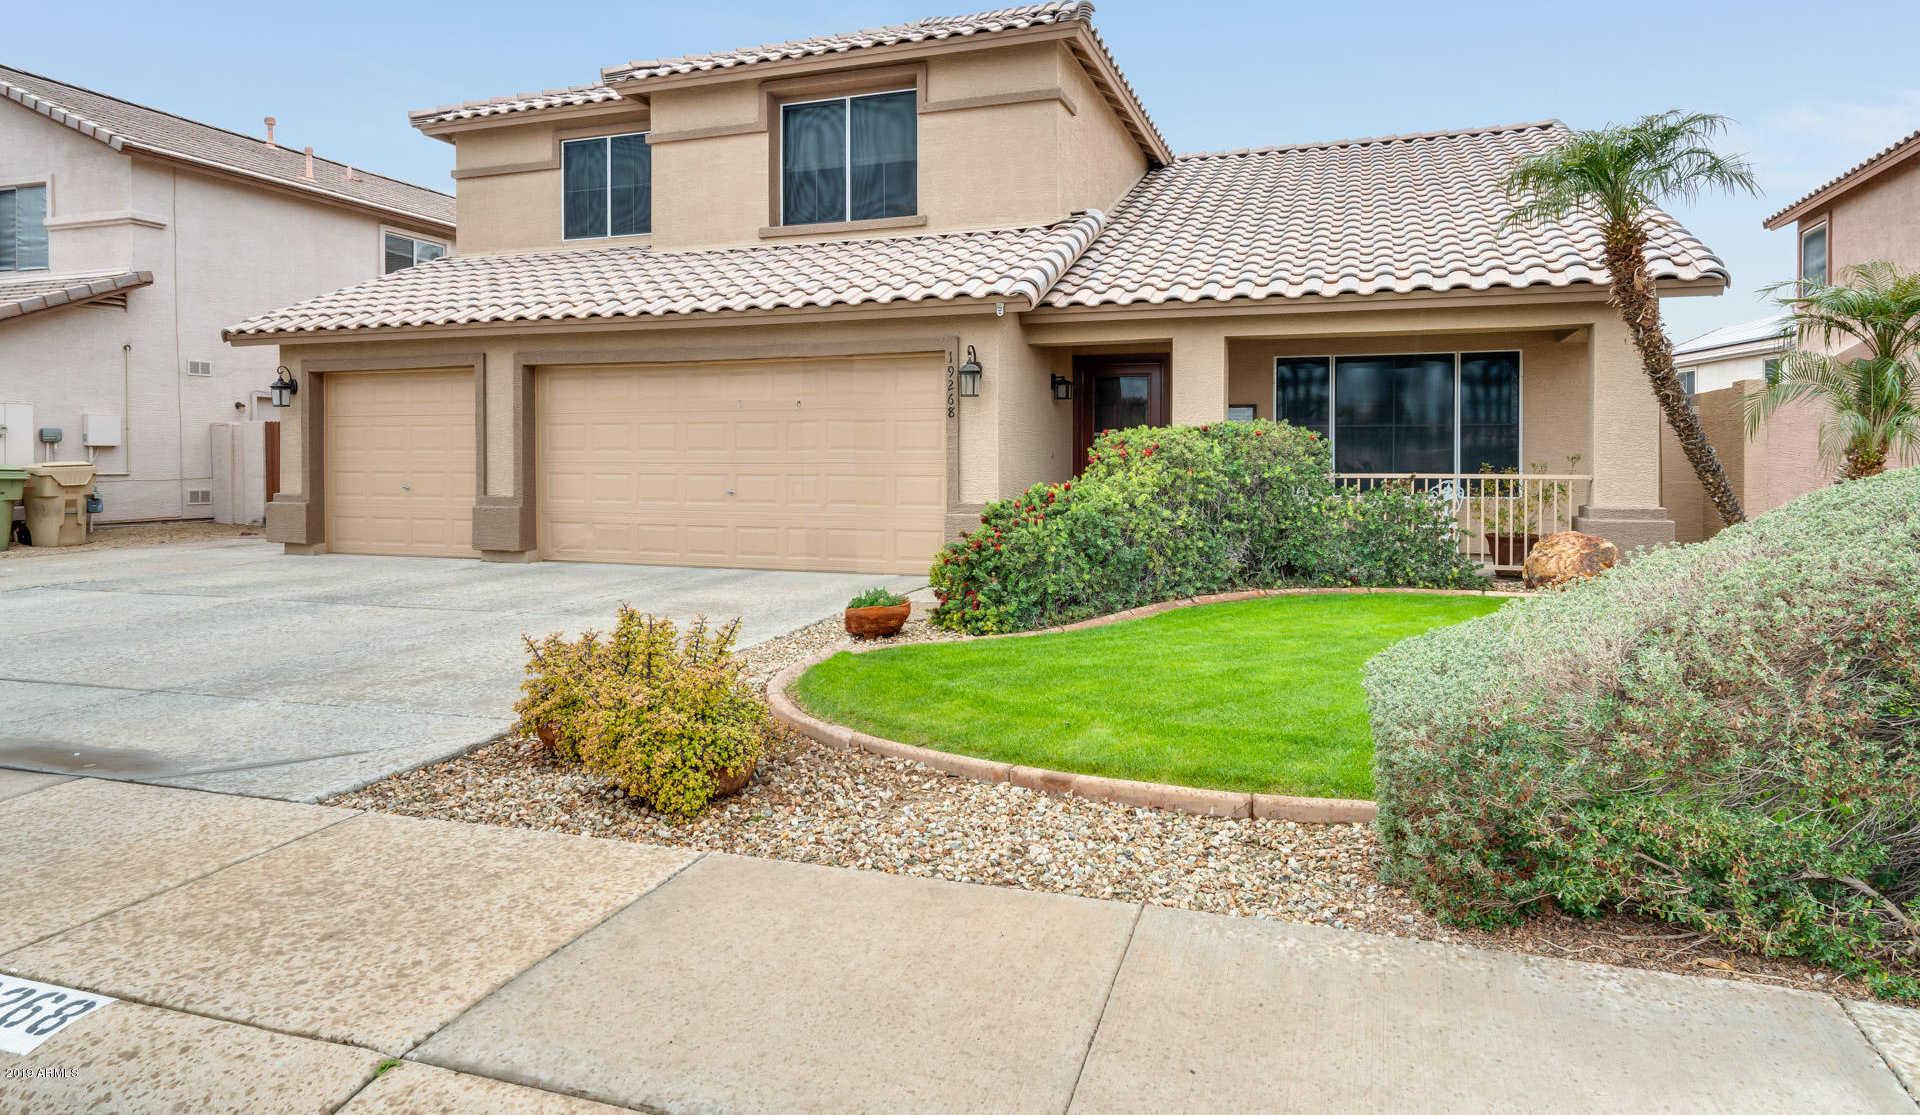 $370,000 - 5Br/3Ba - Home for Sale in Carmel Cove Unit 2 Replat, Glendale